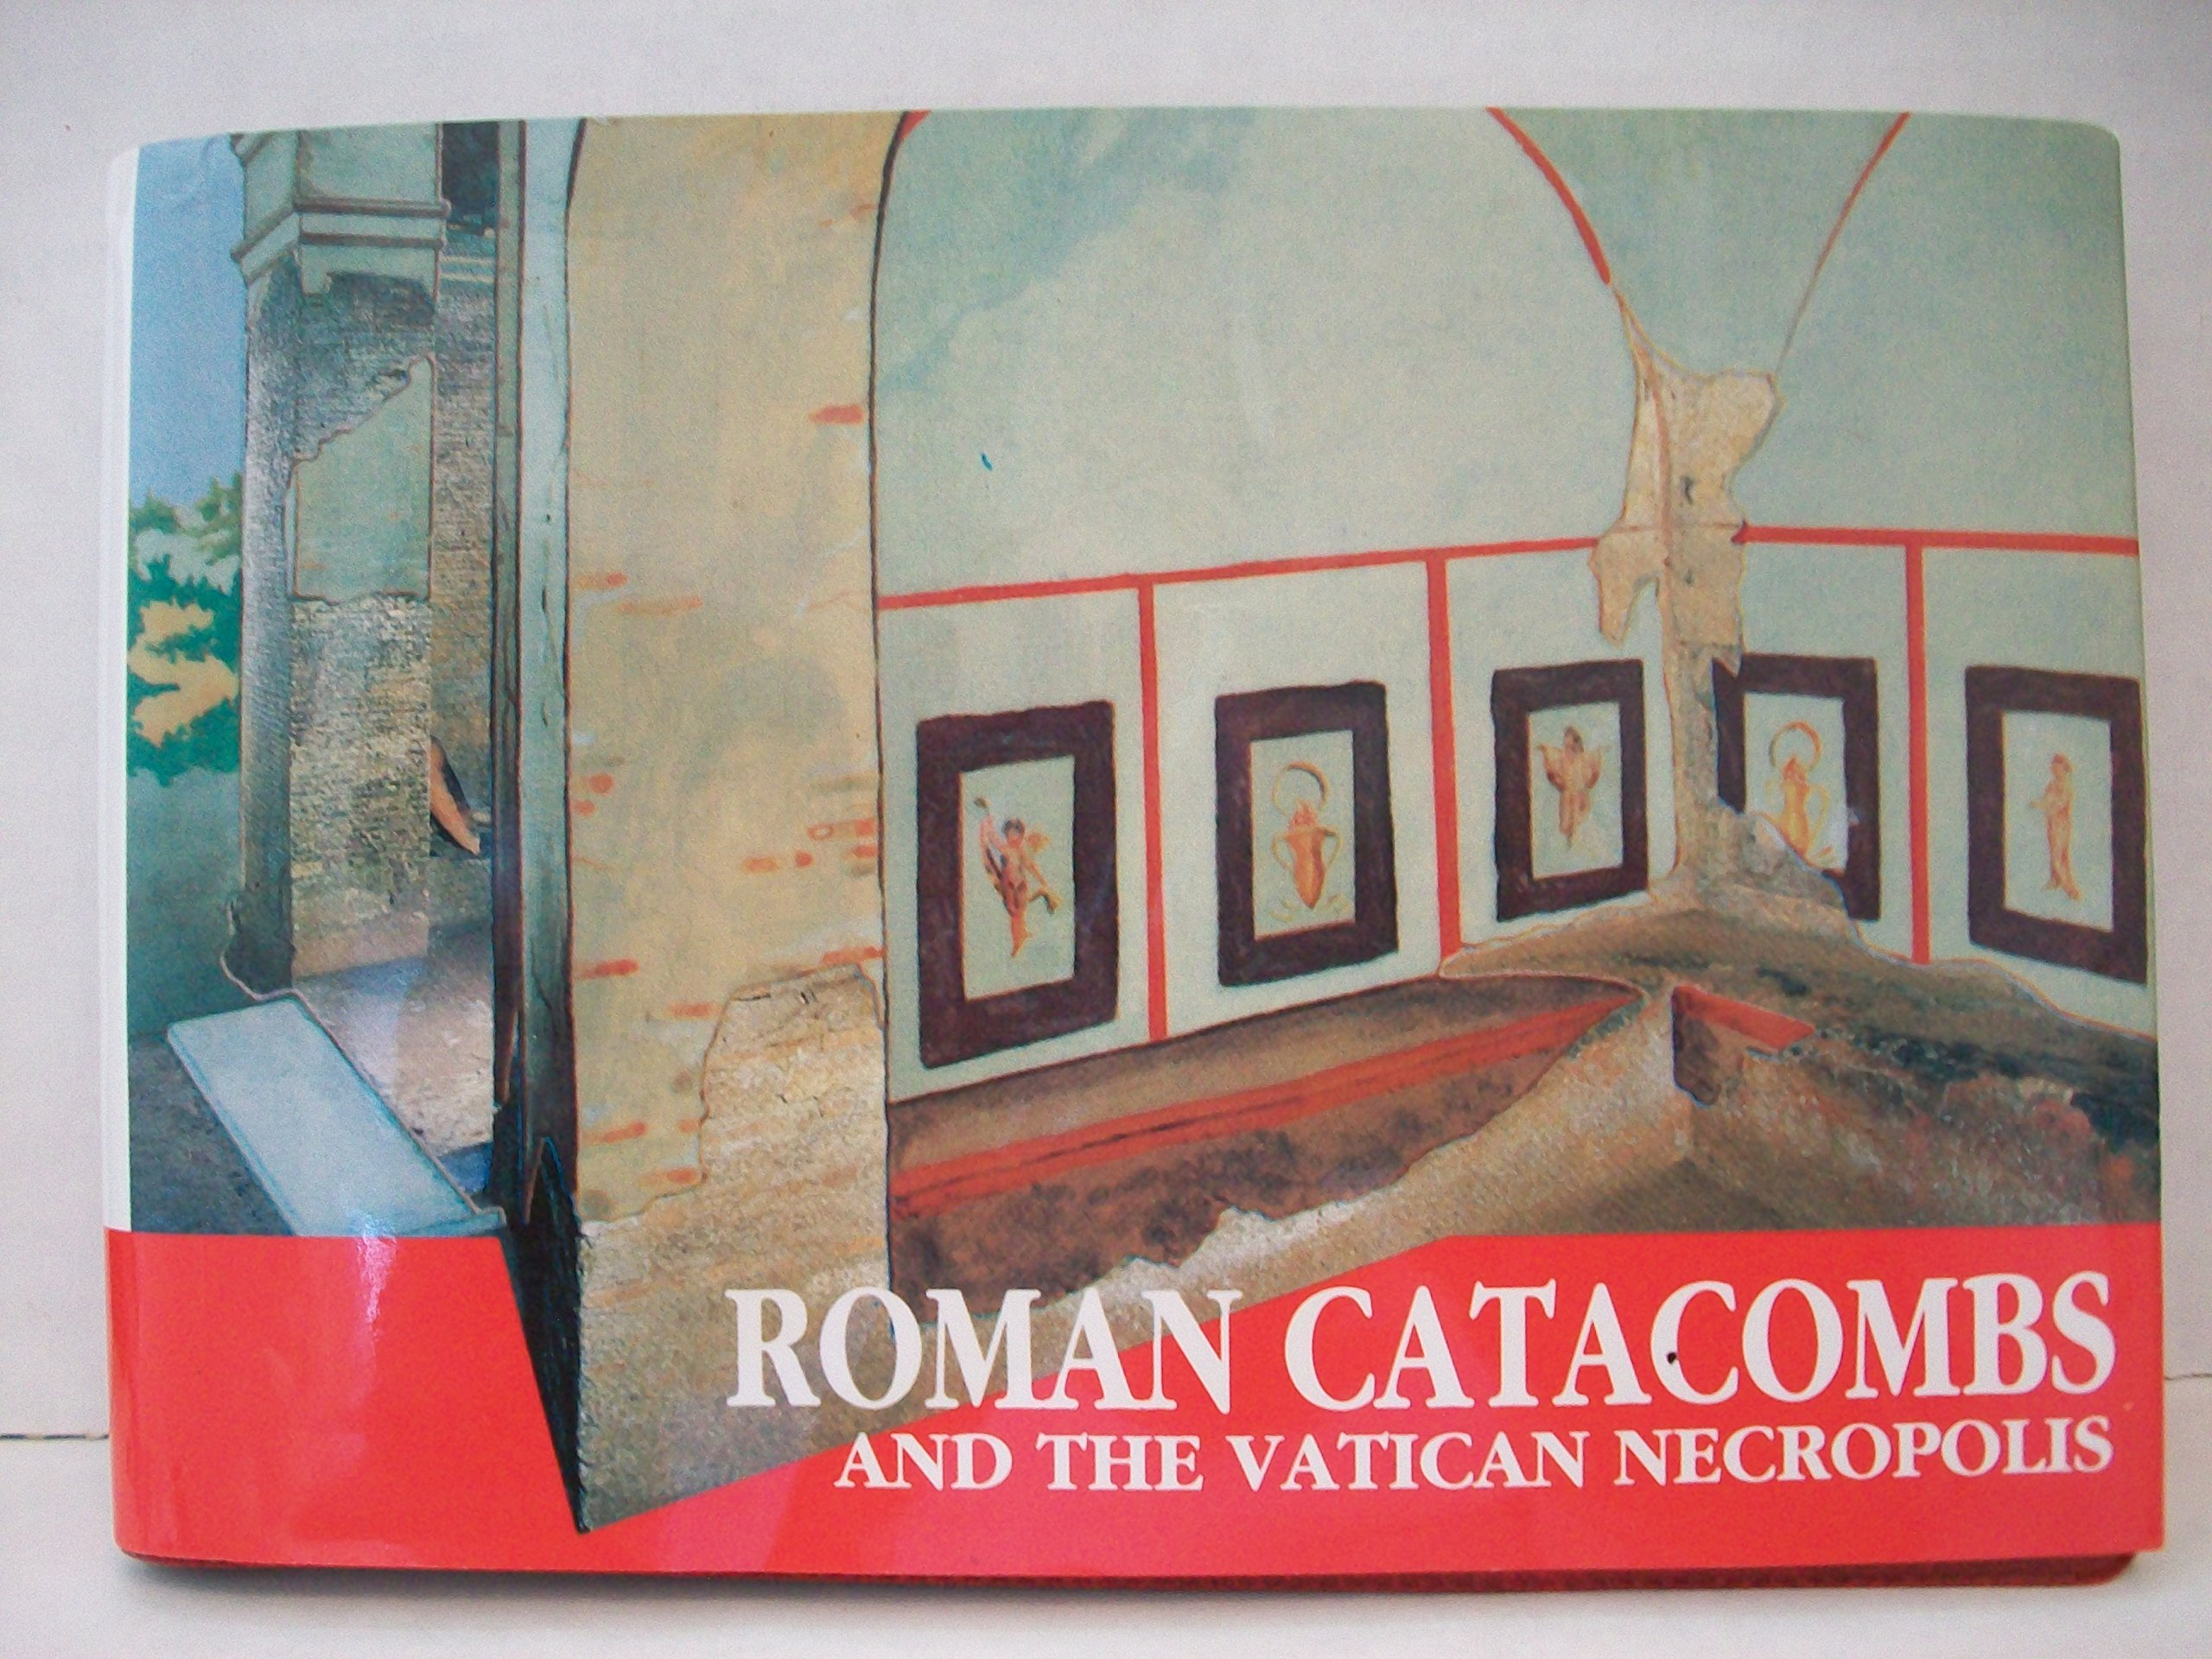 Roman catacombs and the vatican necropolis: A Guide with Reconstructions Past & Present S.: Amazon.es: Pergola, Philippe: Libros en idiomas extranjeros